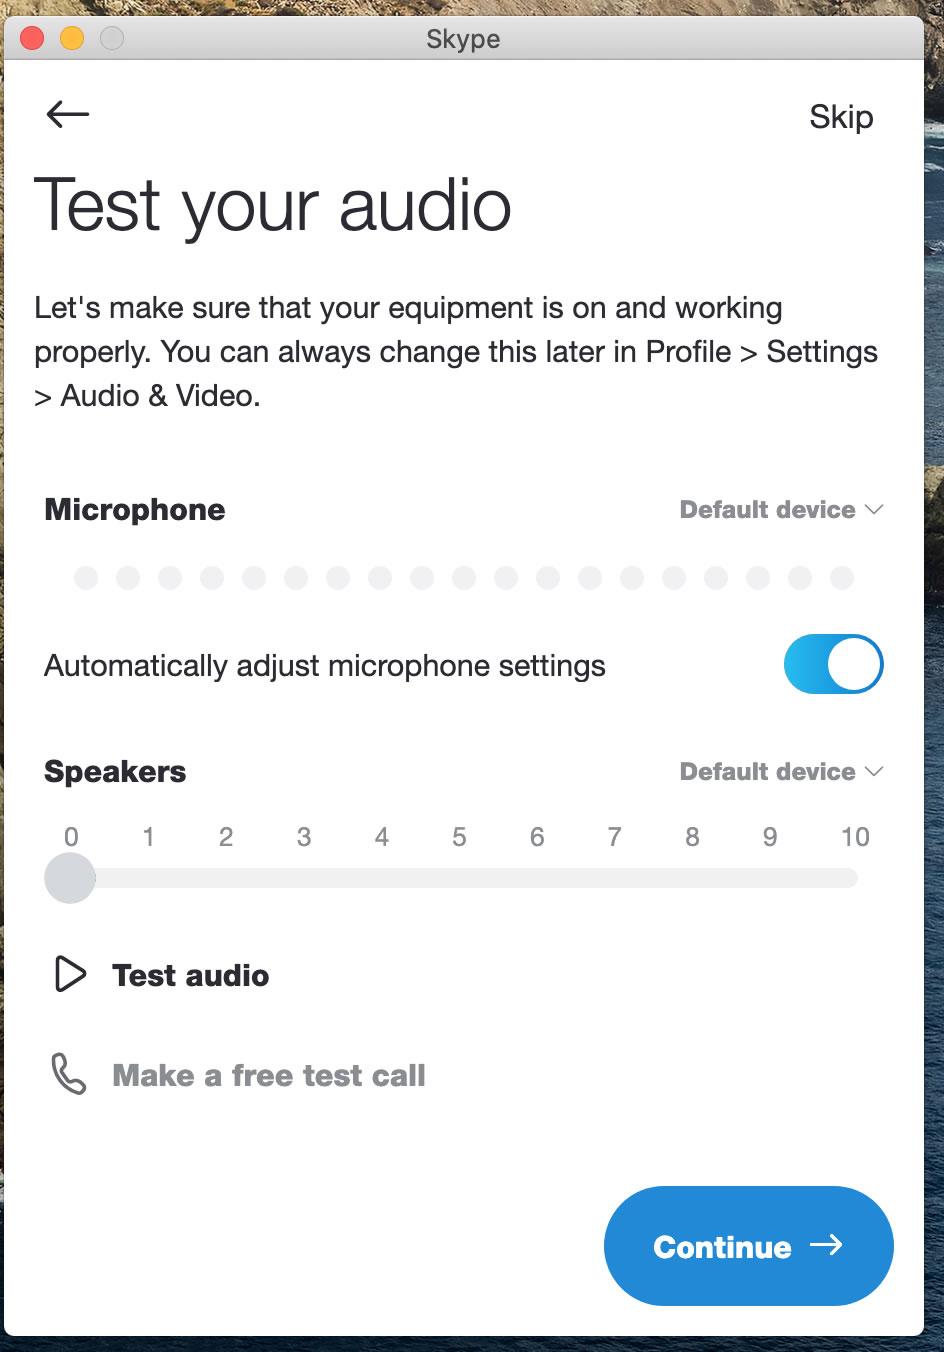 [Skype test your audio ]